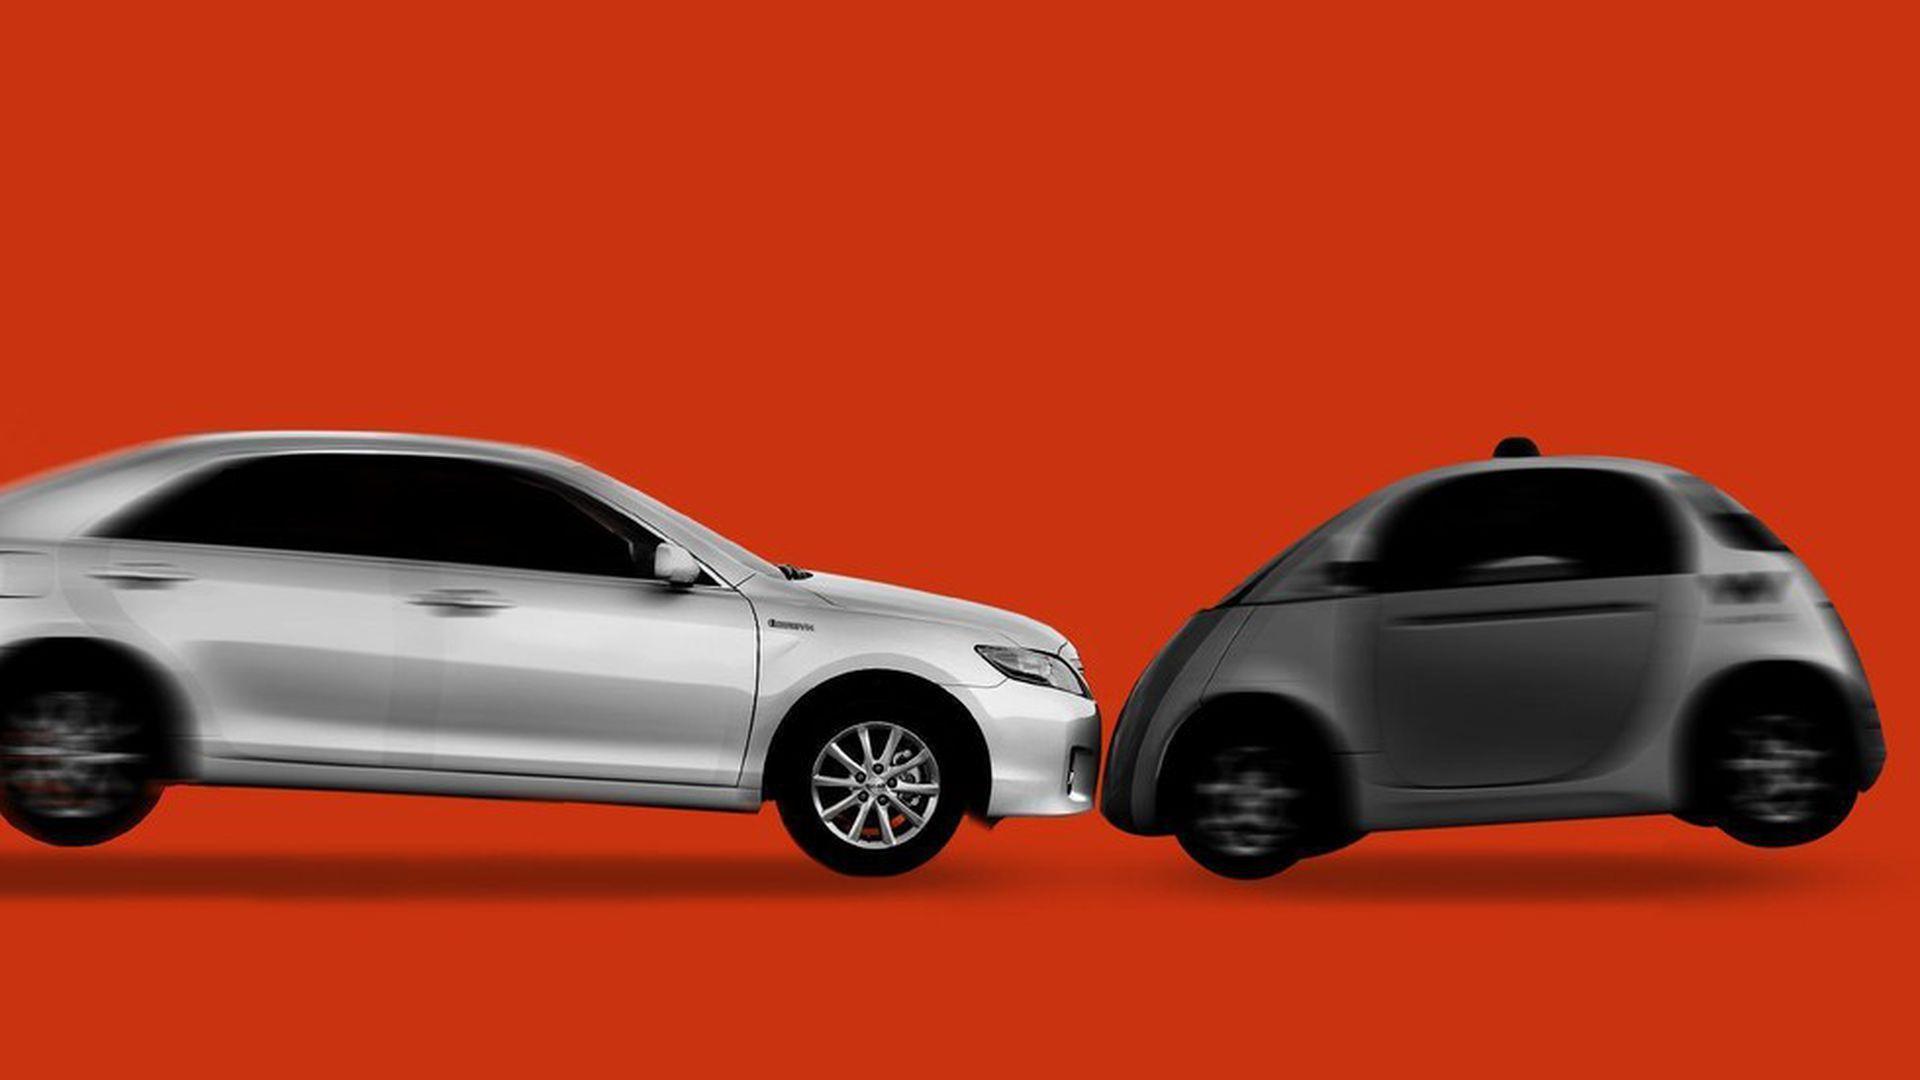 illustreation of uber car and waymo car colliding